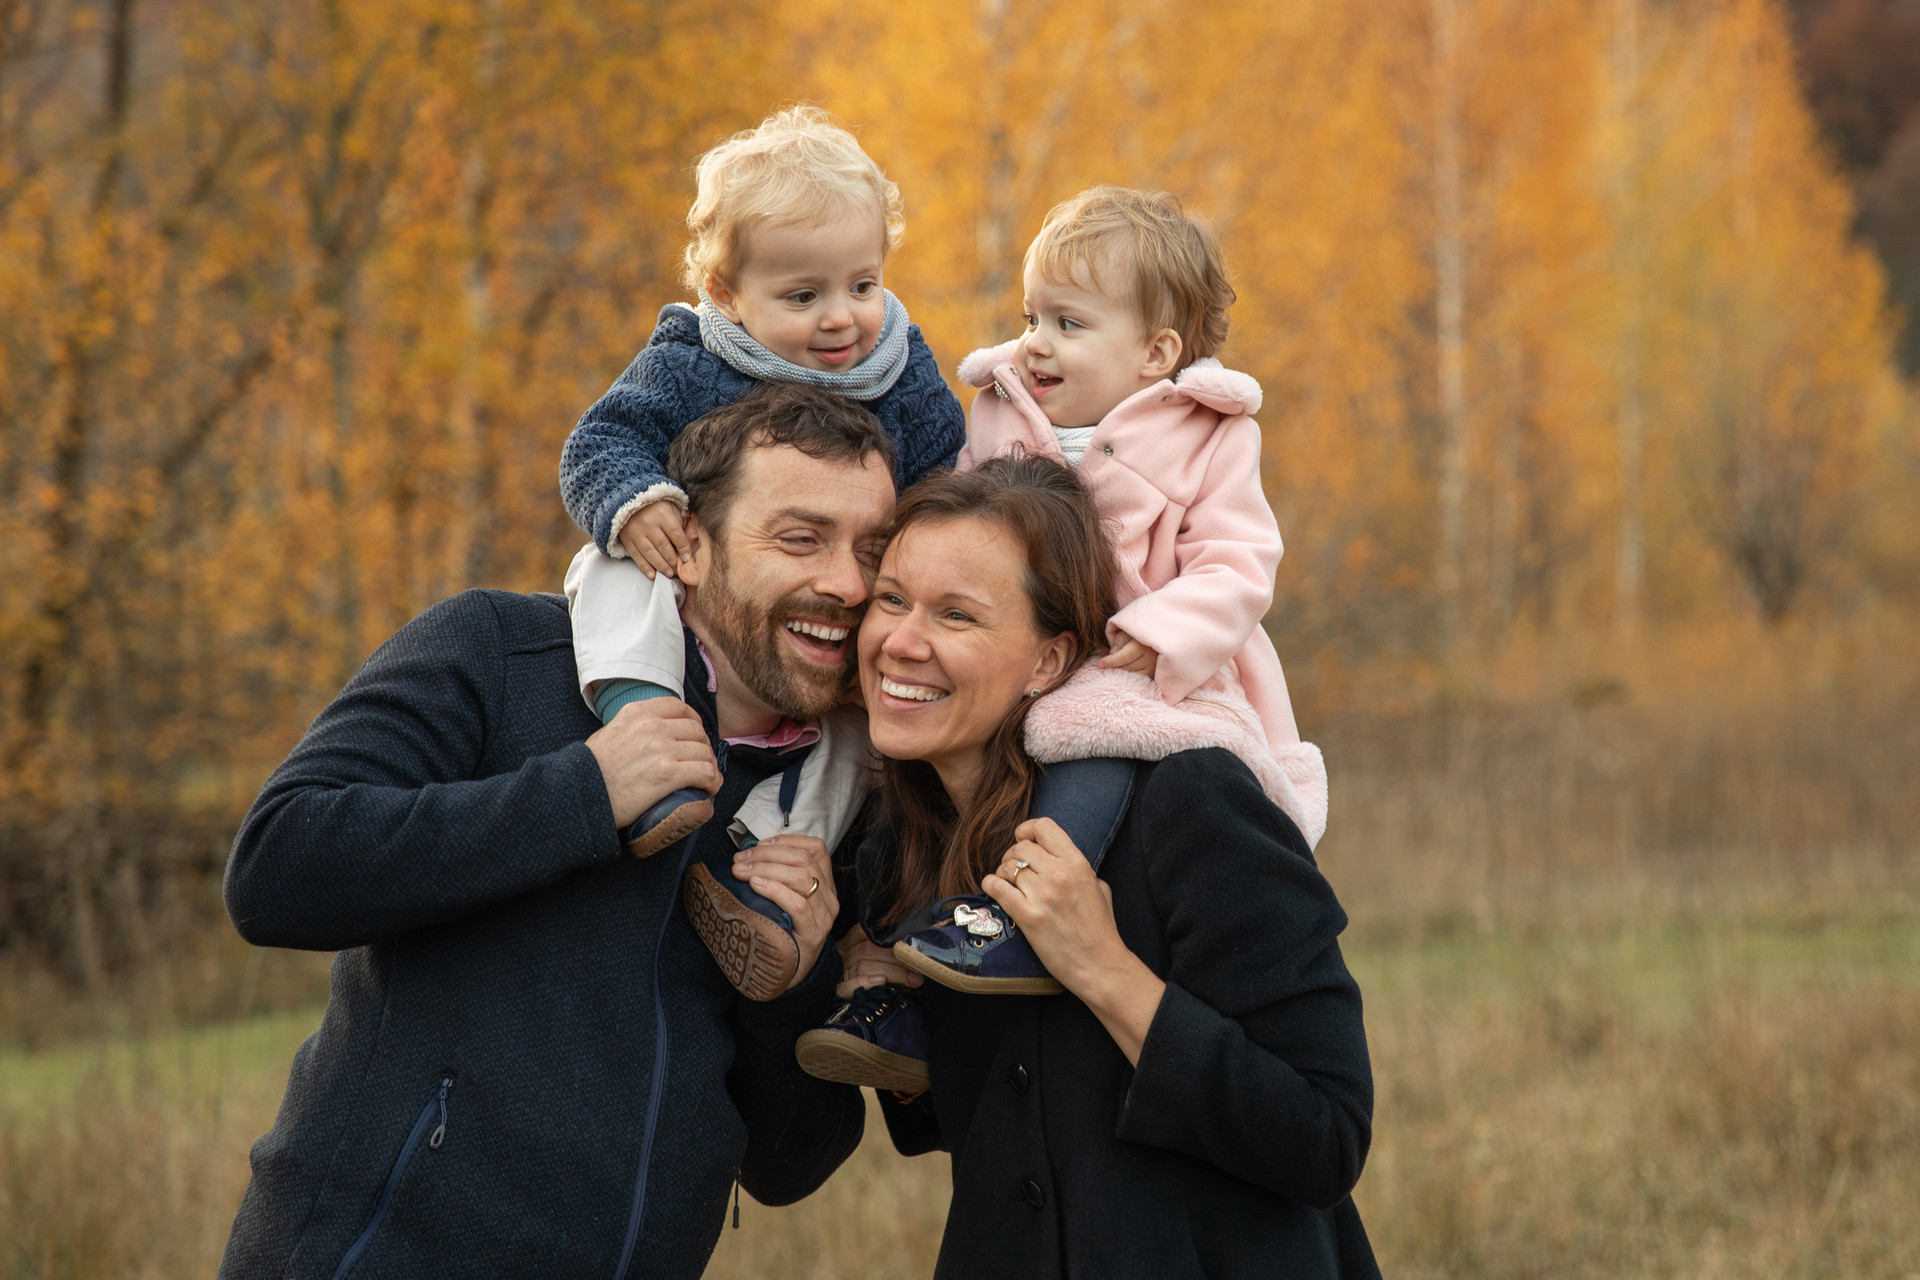 Familien Fotoshooting mit Zwillingen Out